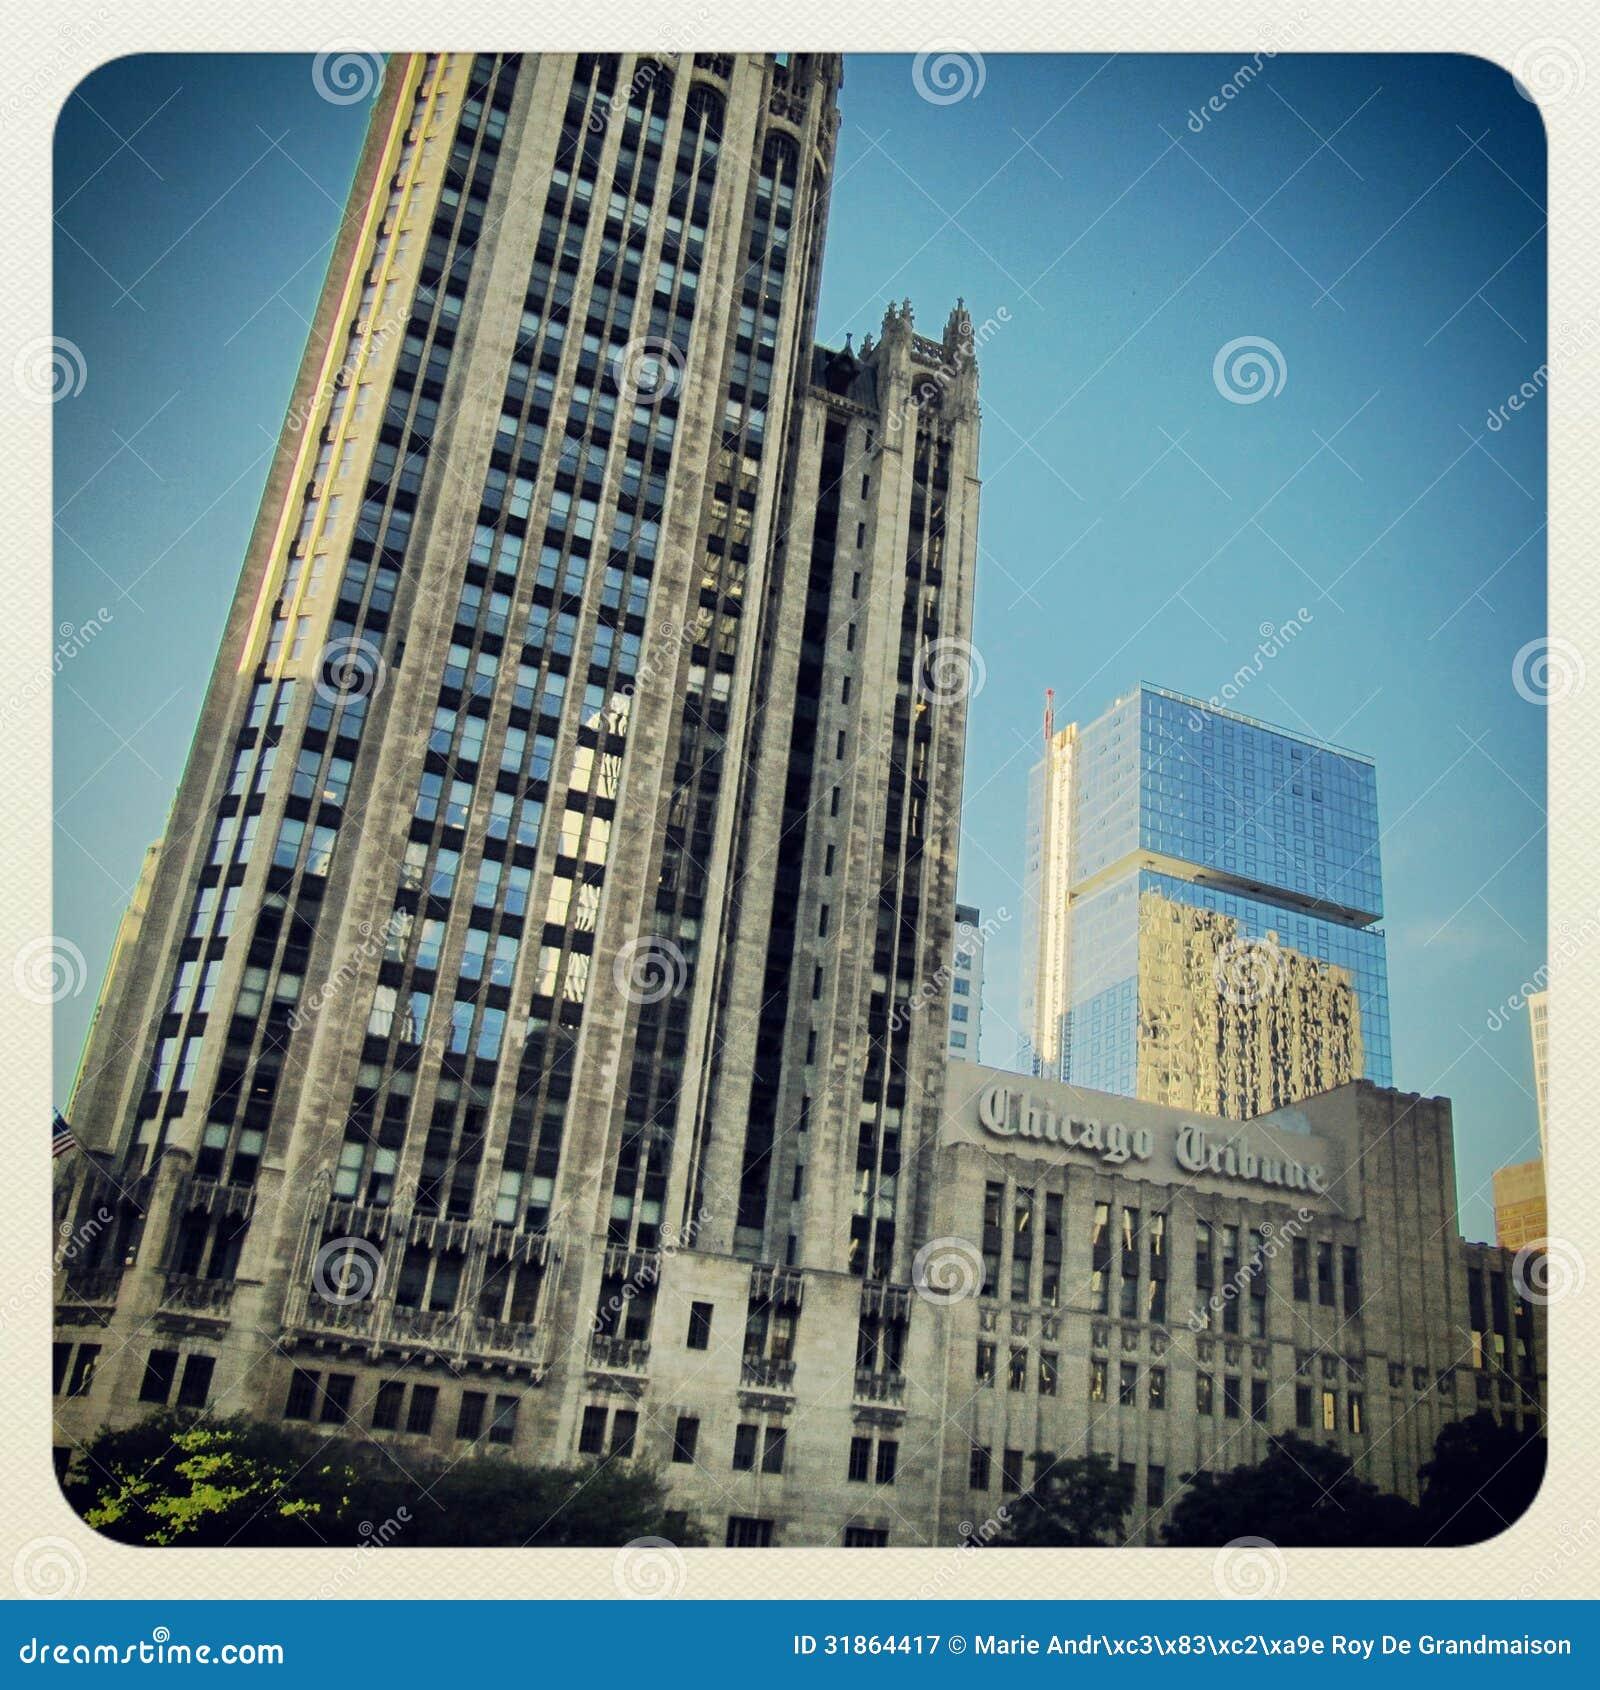 chicago's tribunes server consolidation a success